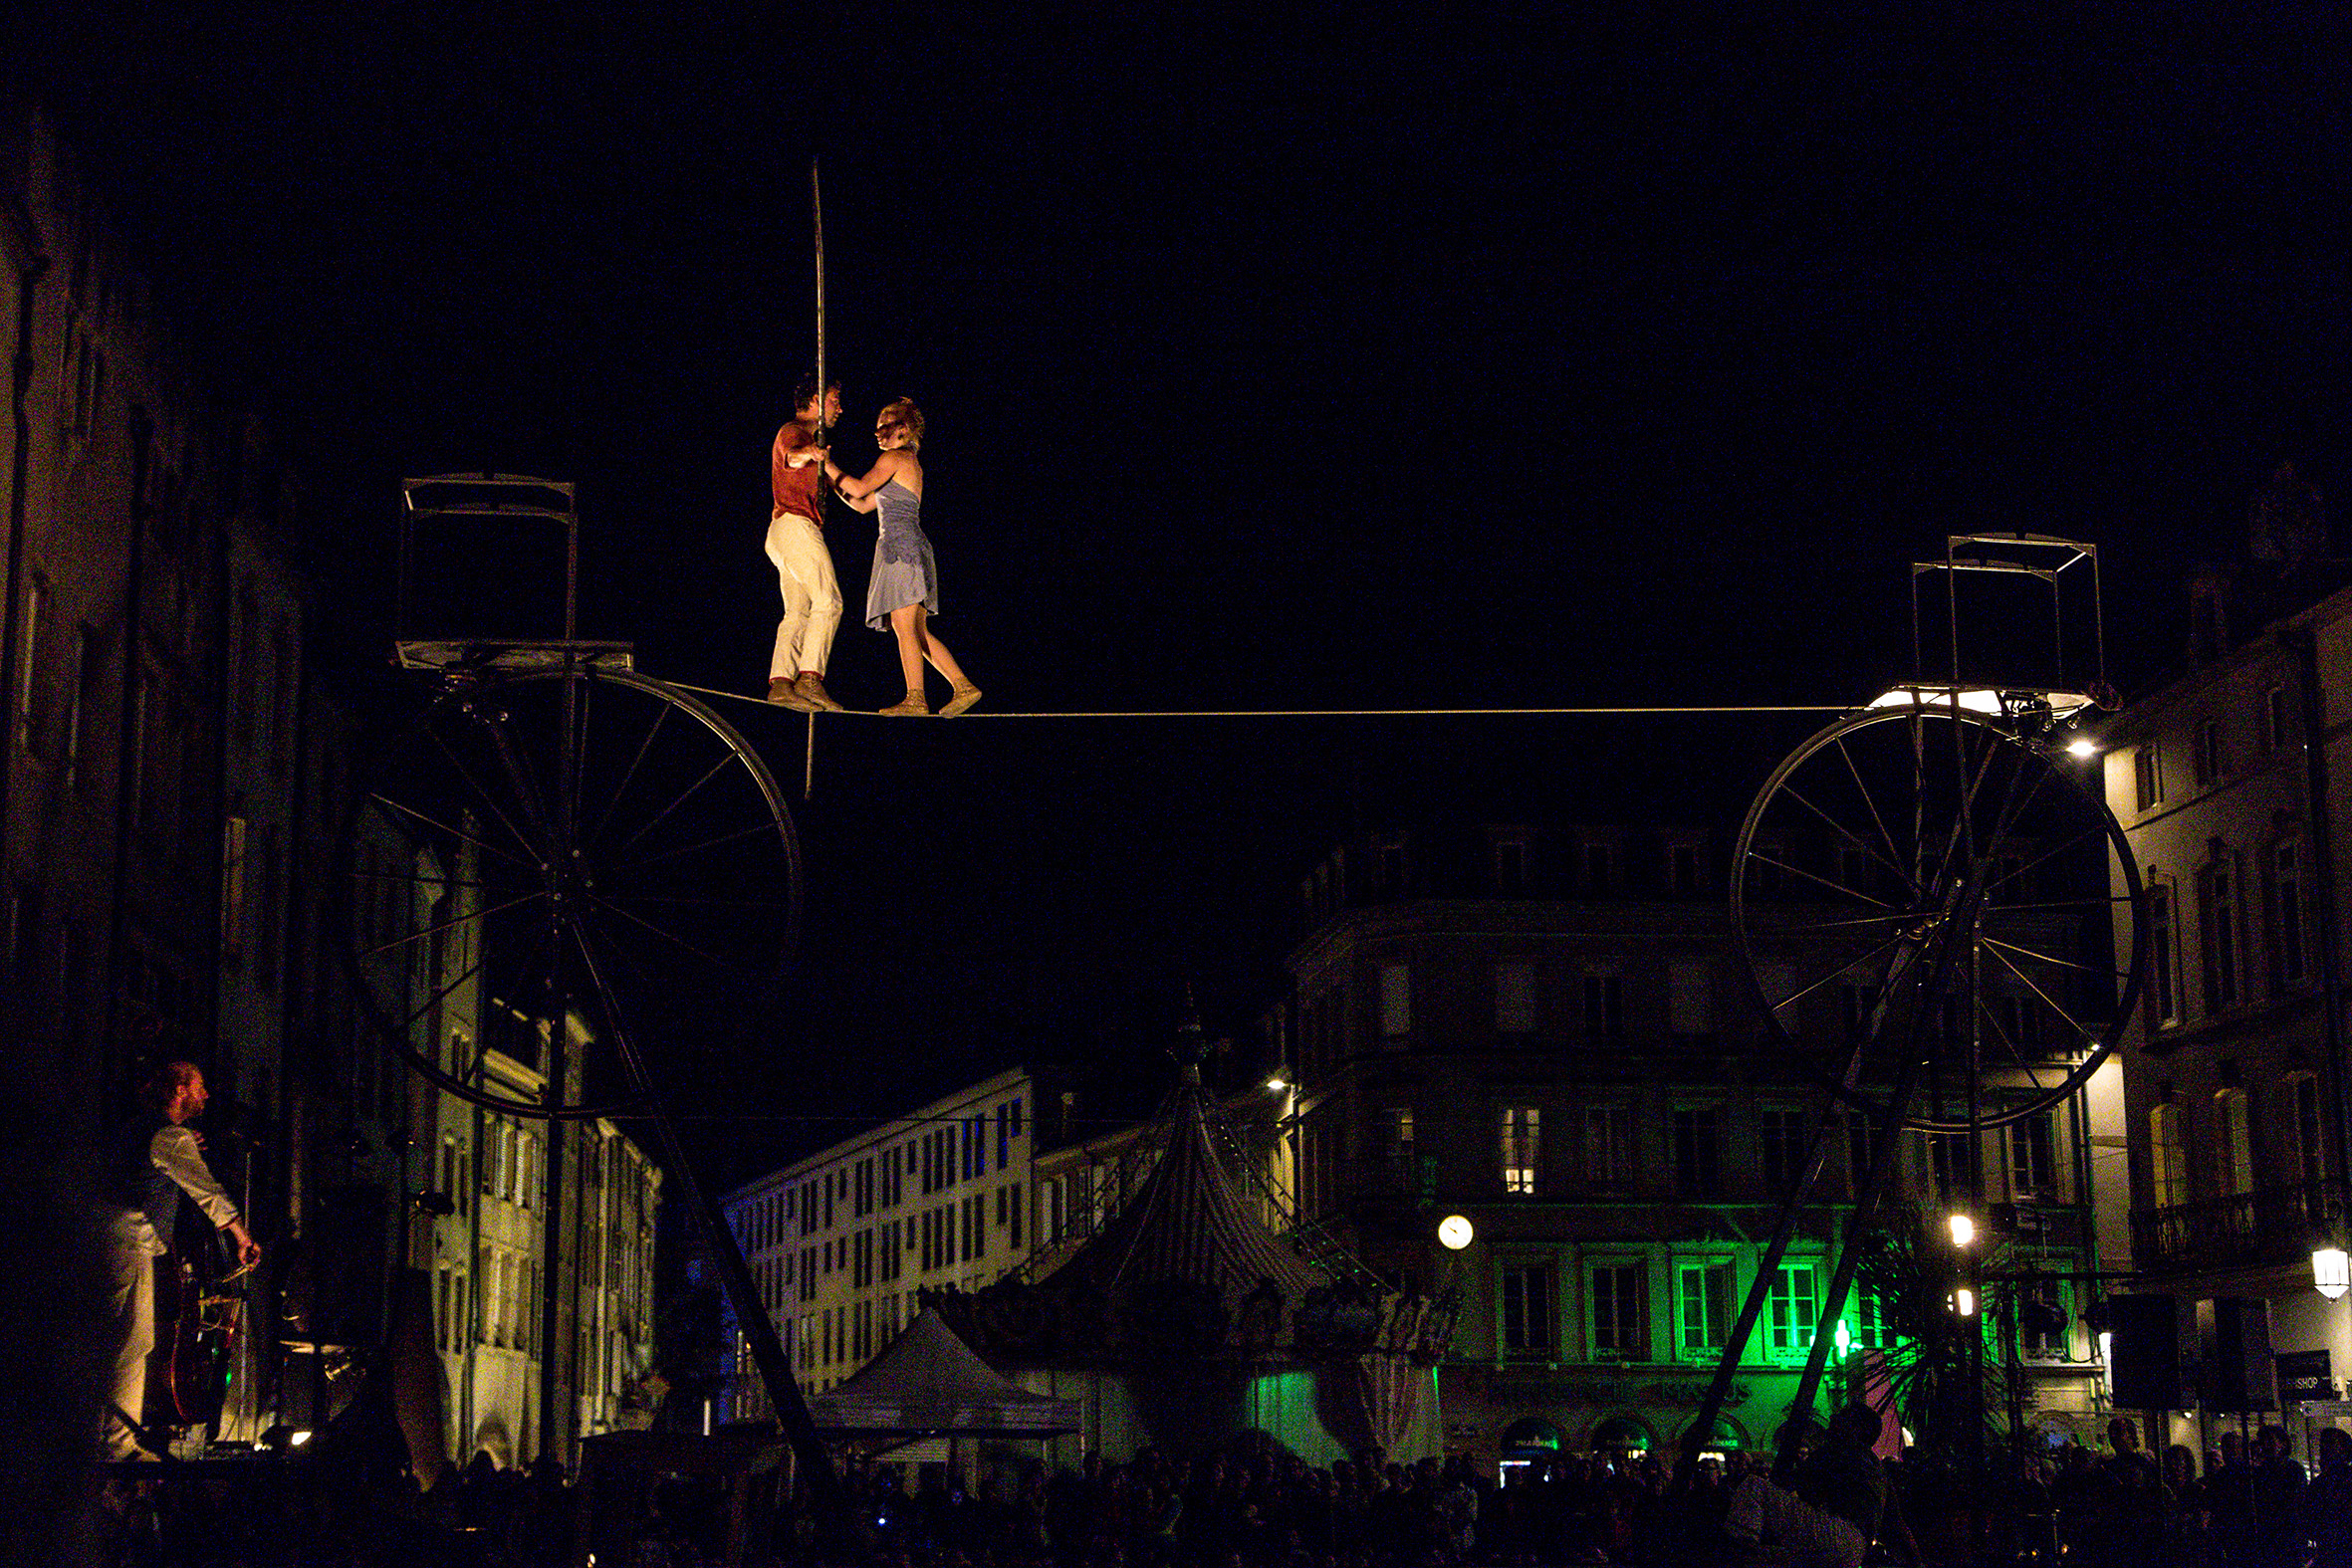 spectacles-sodade-cirque-rouage-mirabelle-metz-2015-marie-colette-becker-04